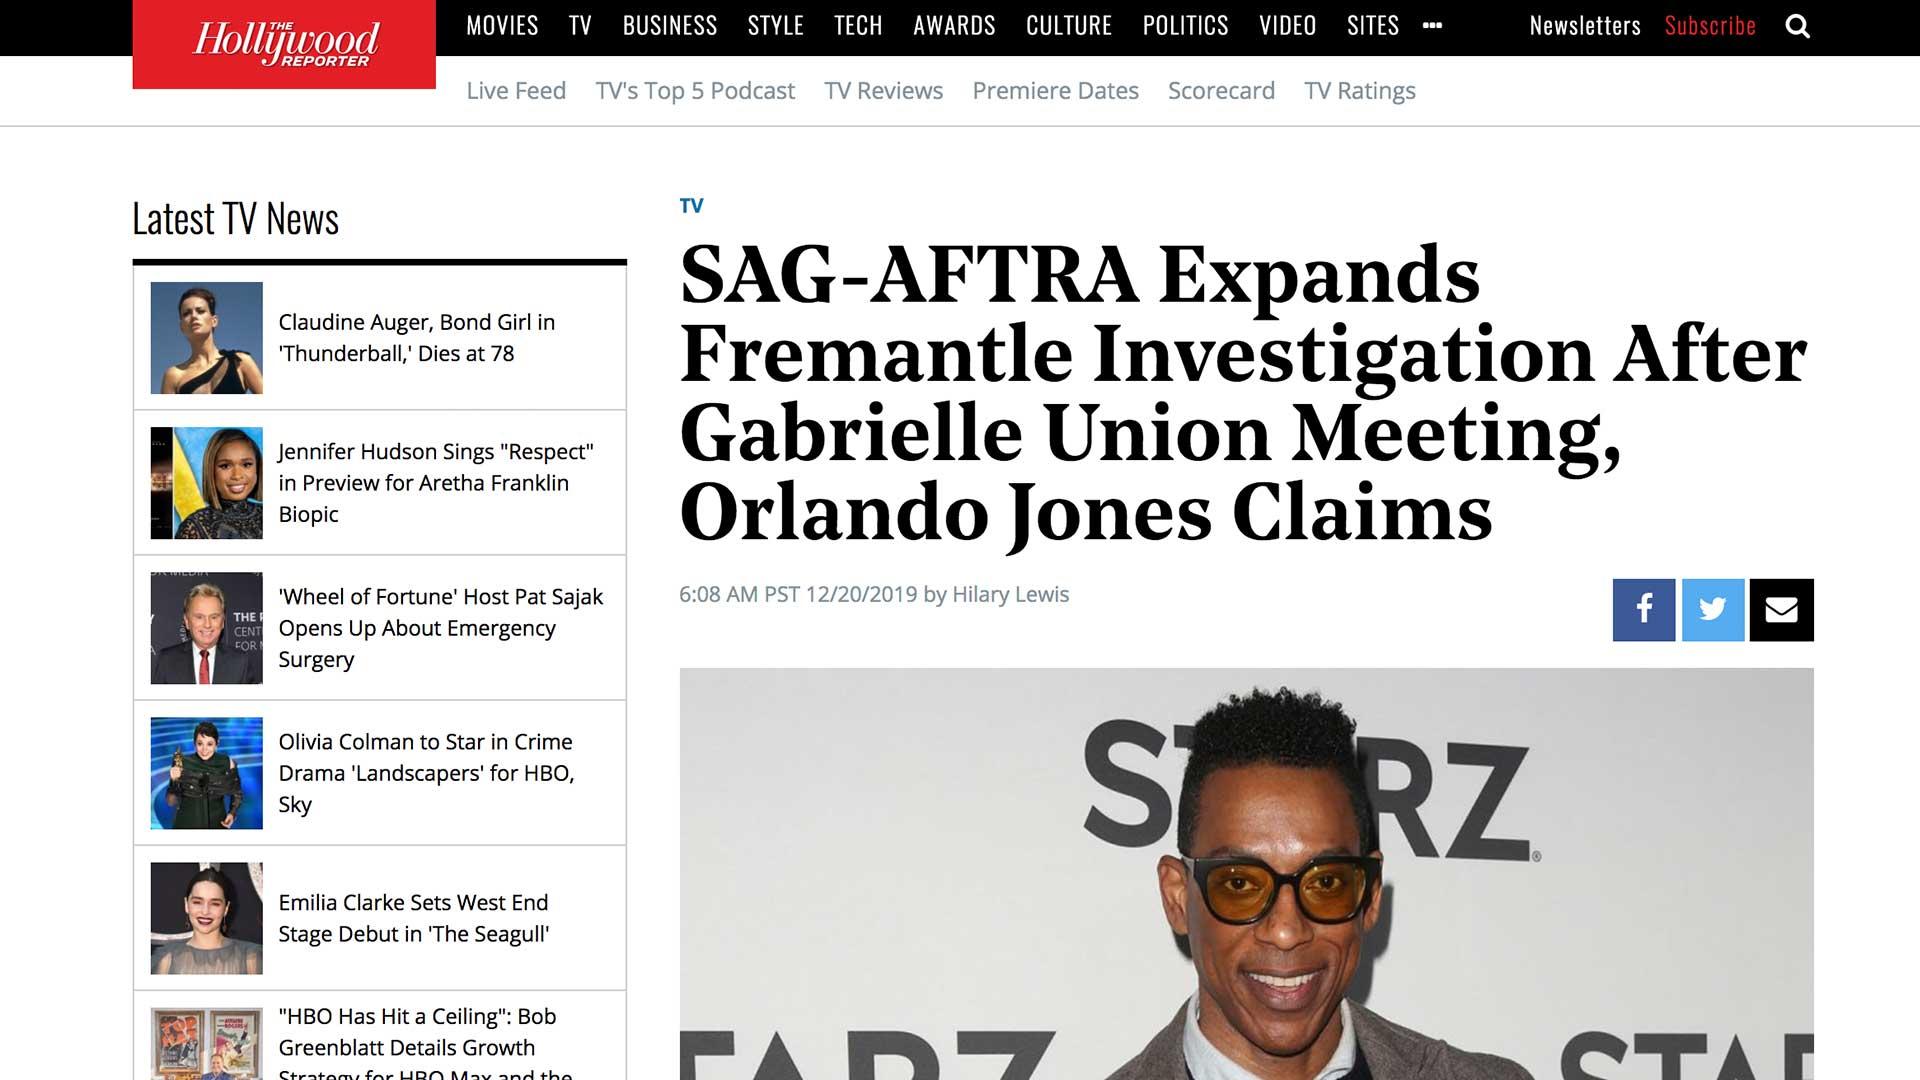 Fairness Rocks News SAG-AFTRA Expands Fremantle Investigation After Gabrielle Union Meeting, Orlando Jones Claims